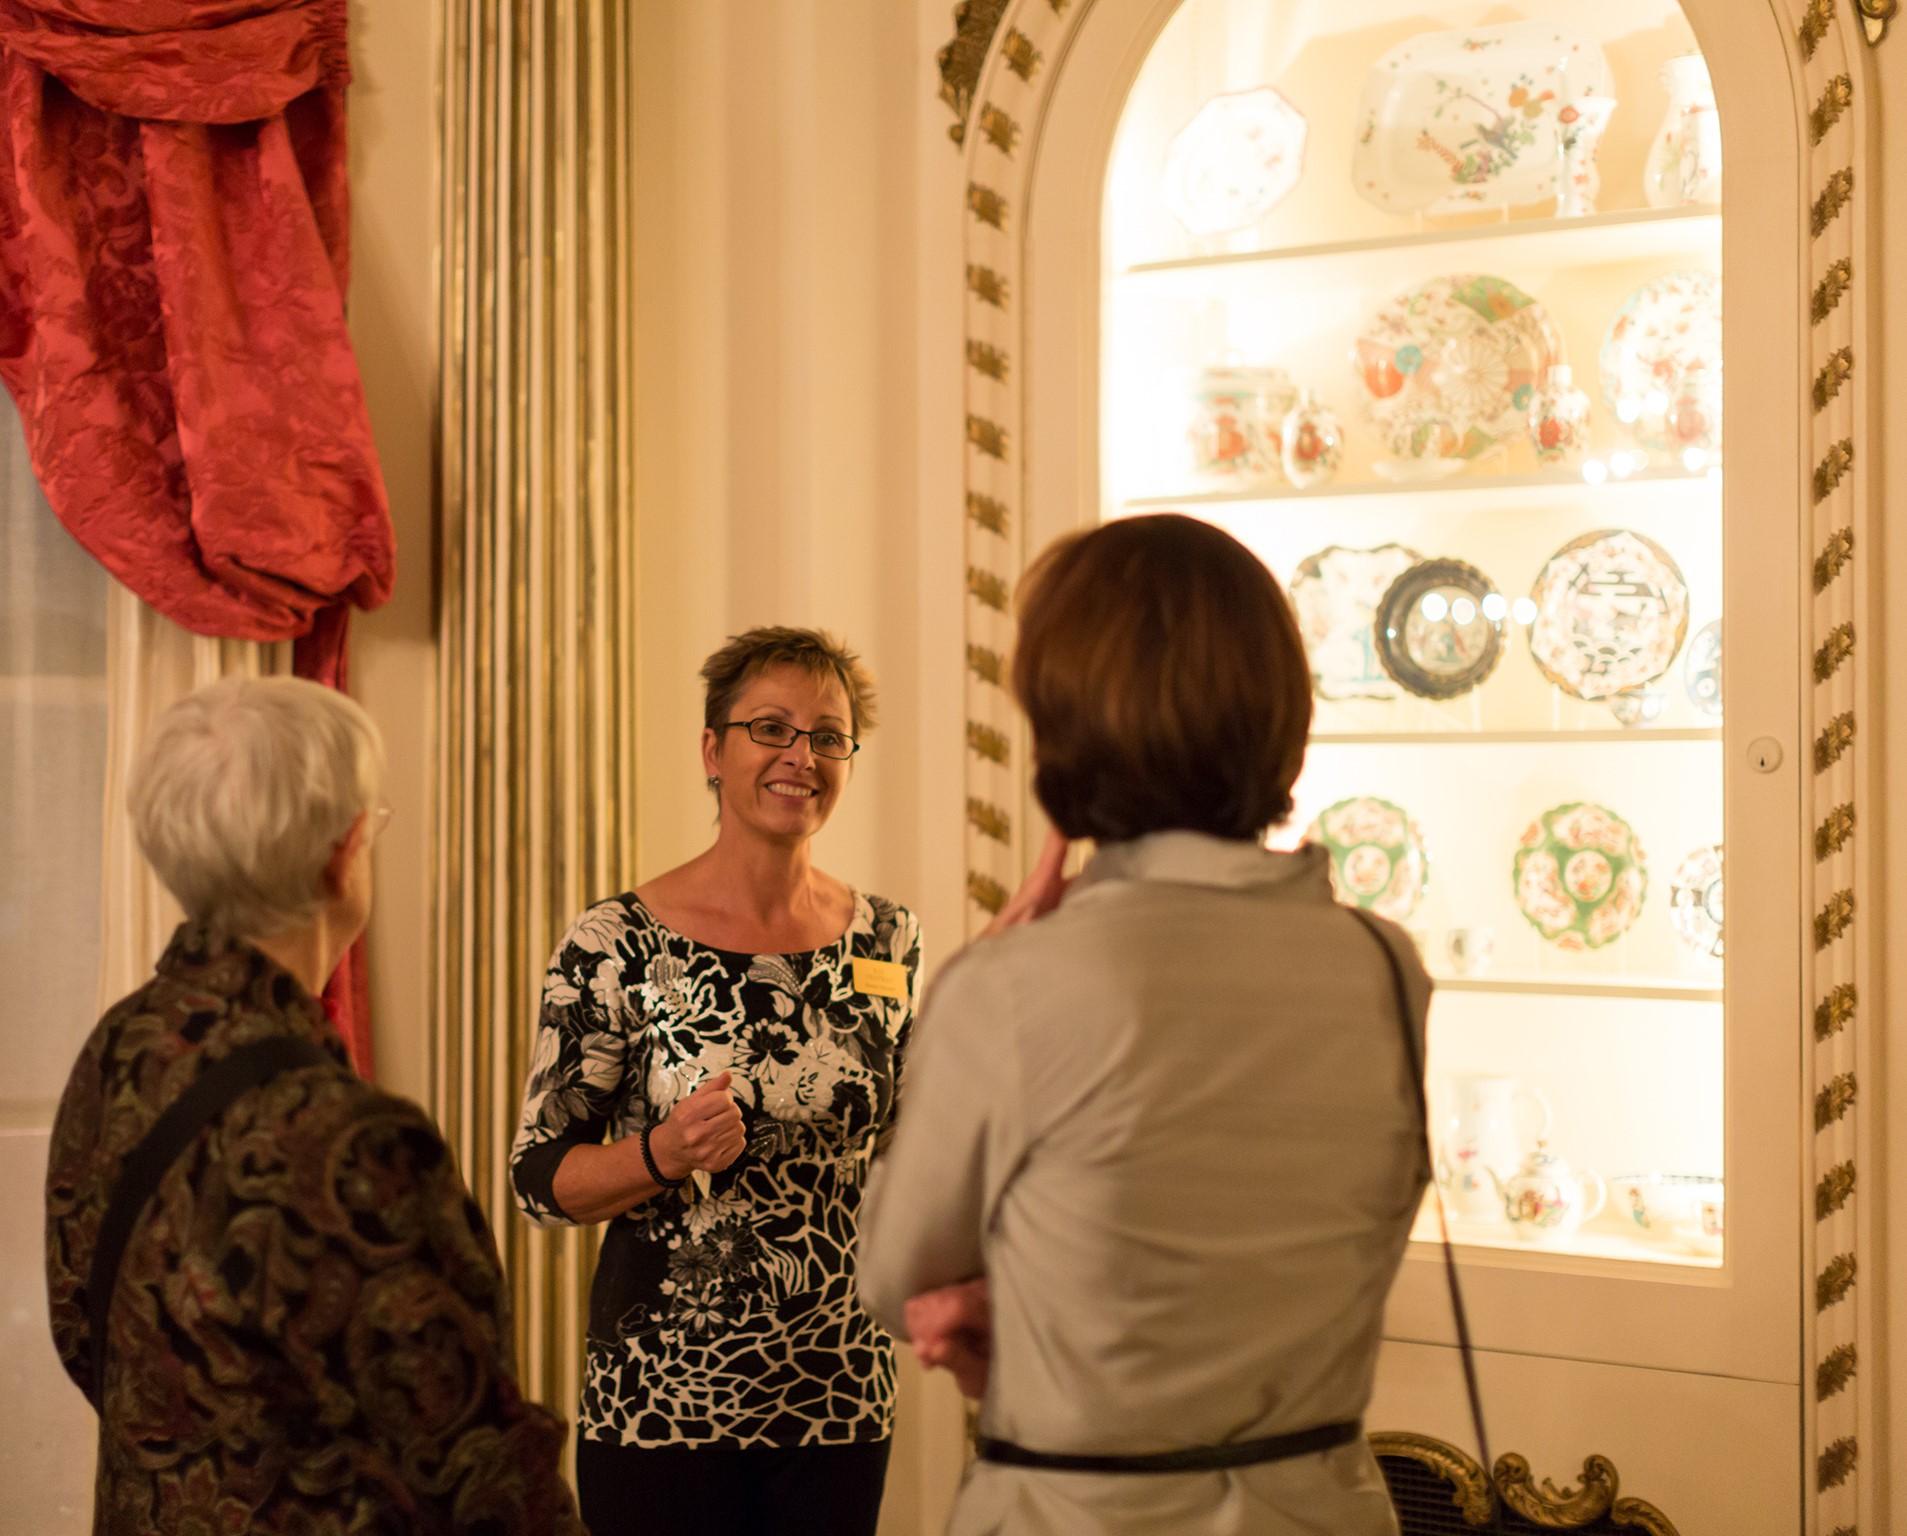 Rienzi gallery talk / tour with porcelain